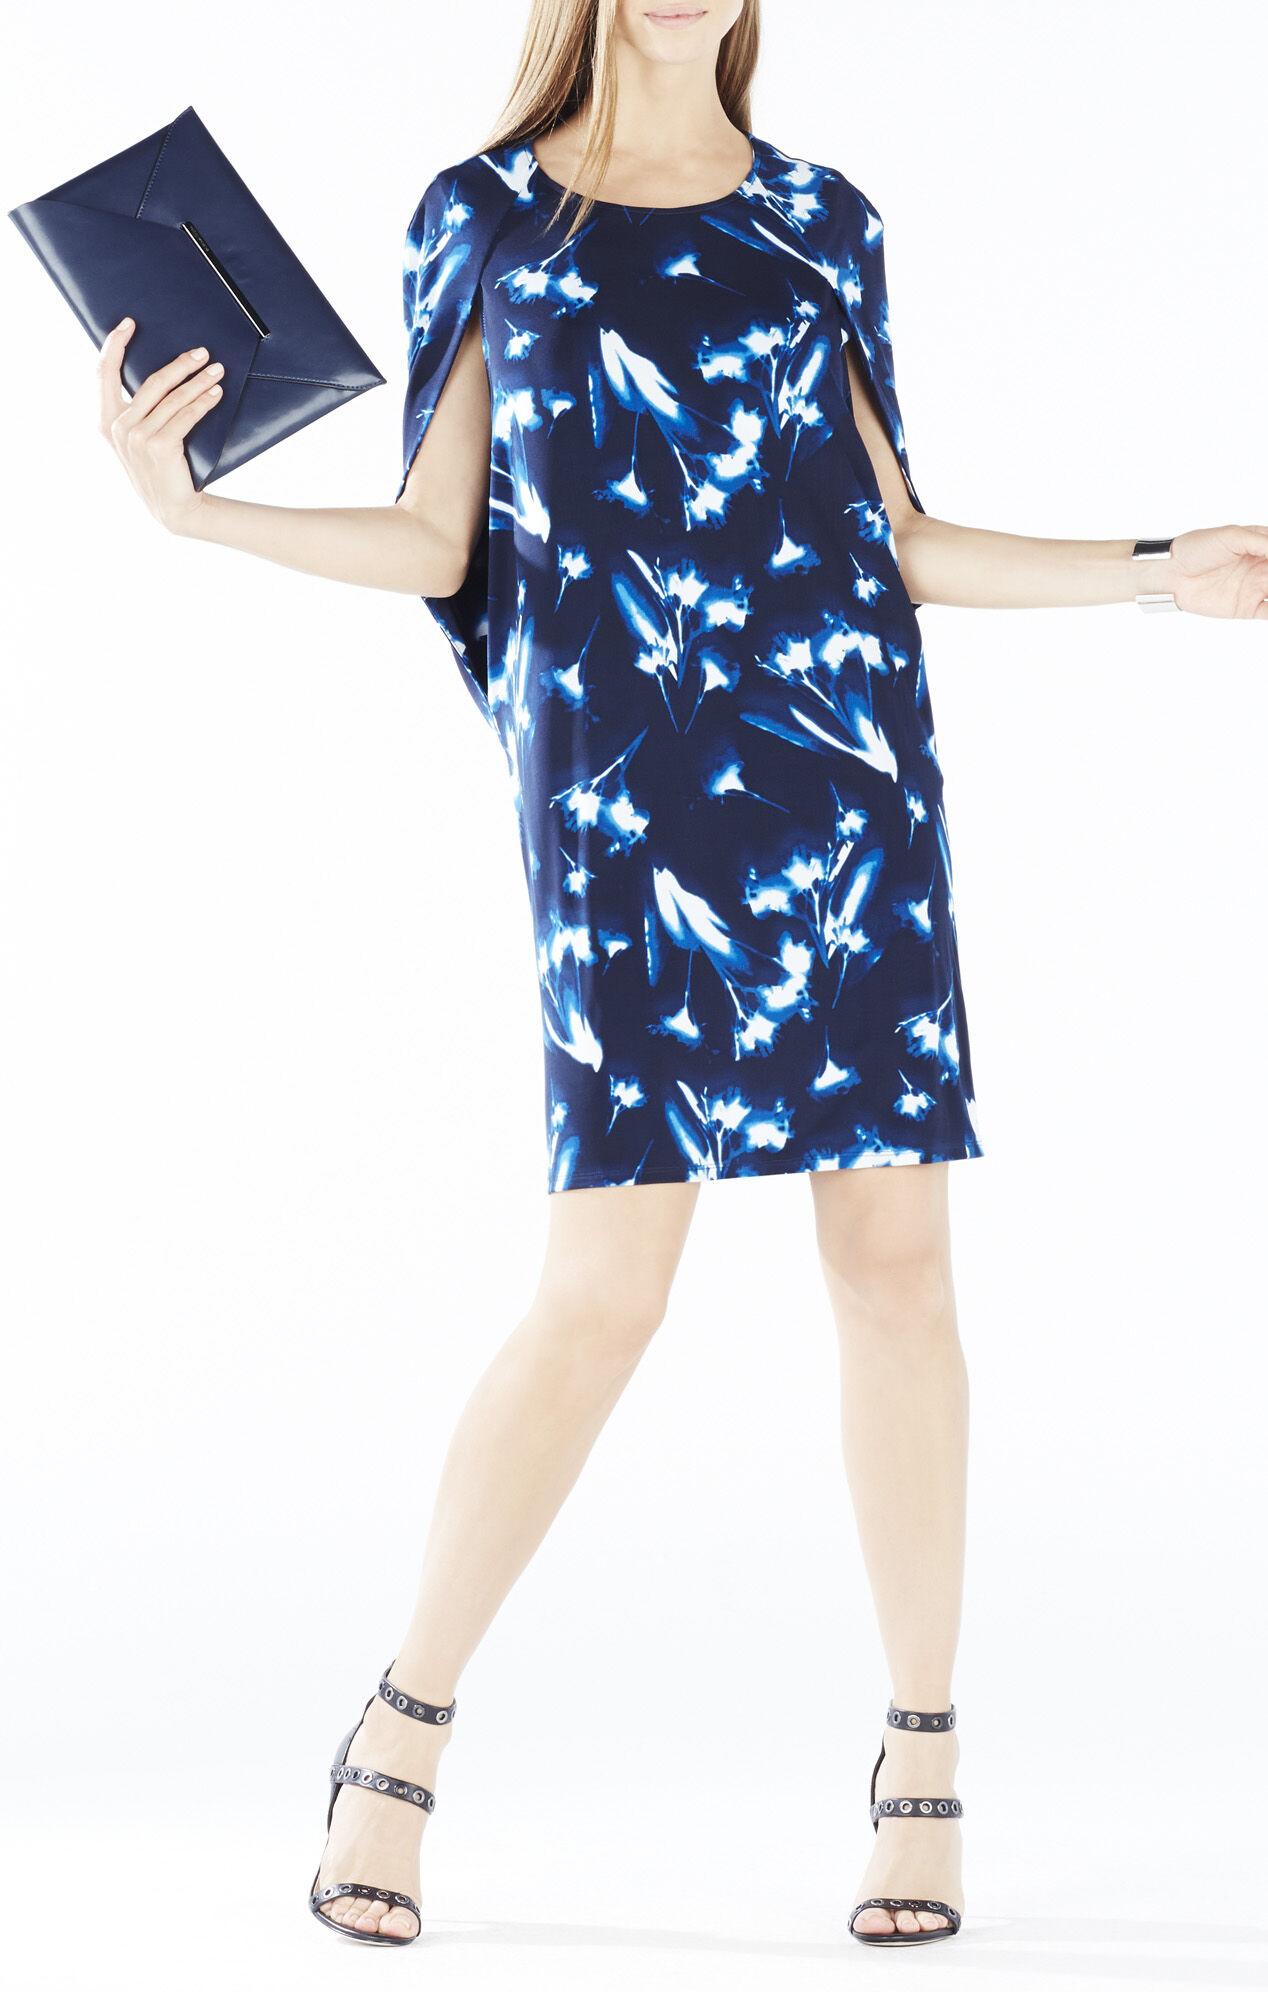 Jordynn X-Ray Floral Print Cape Dress